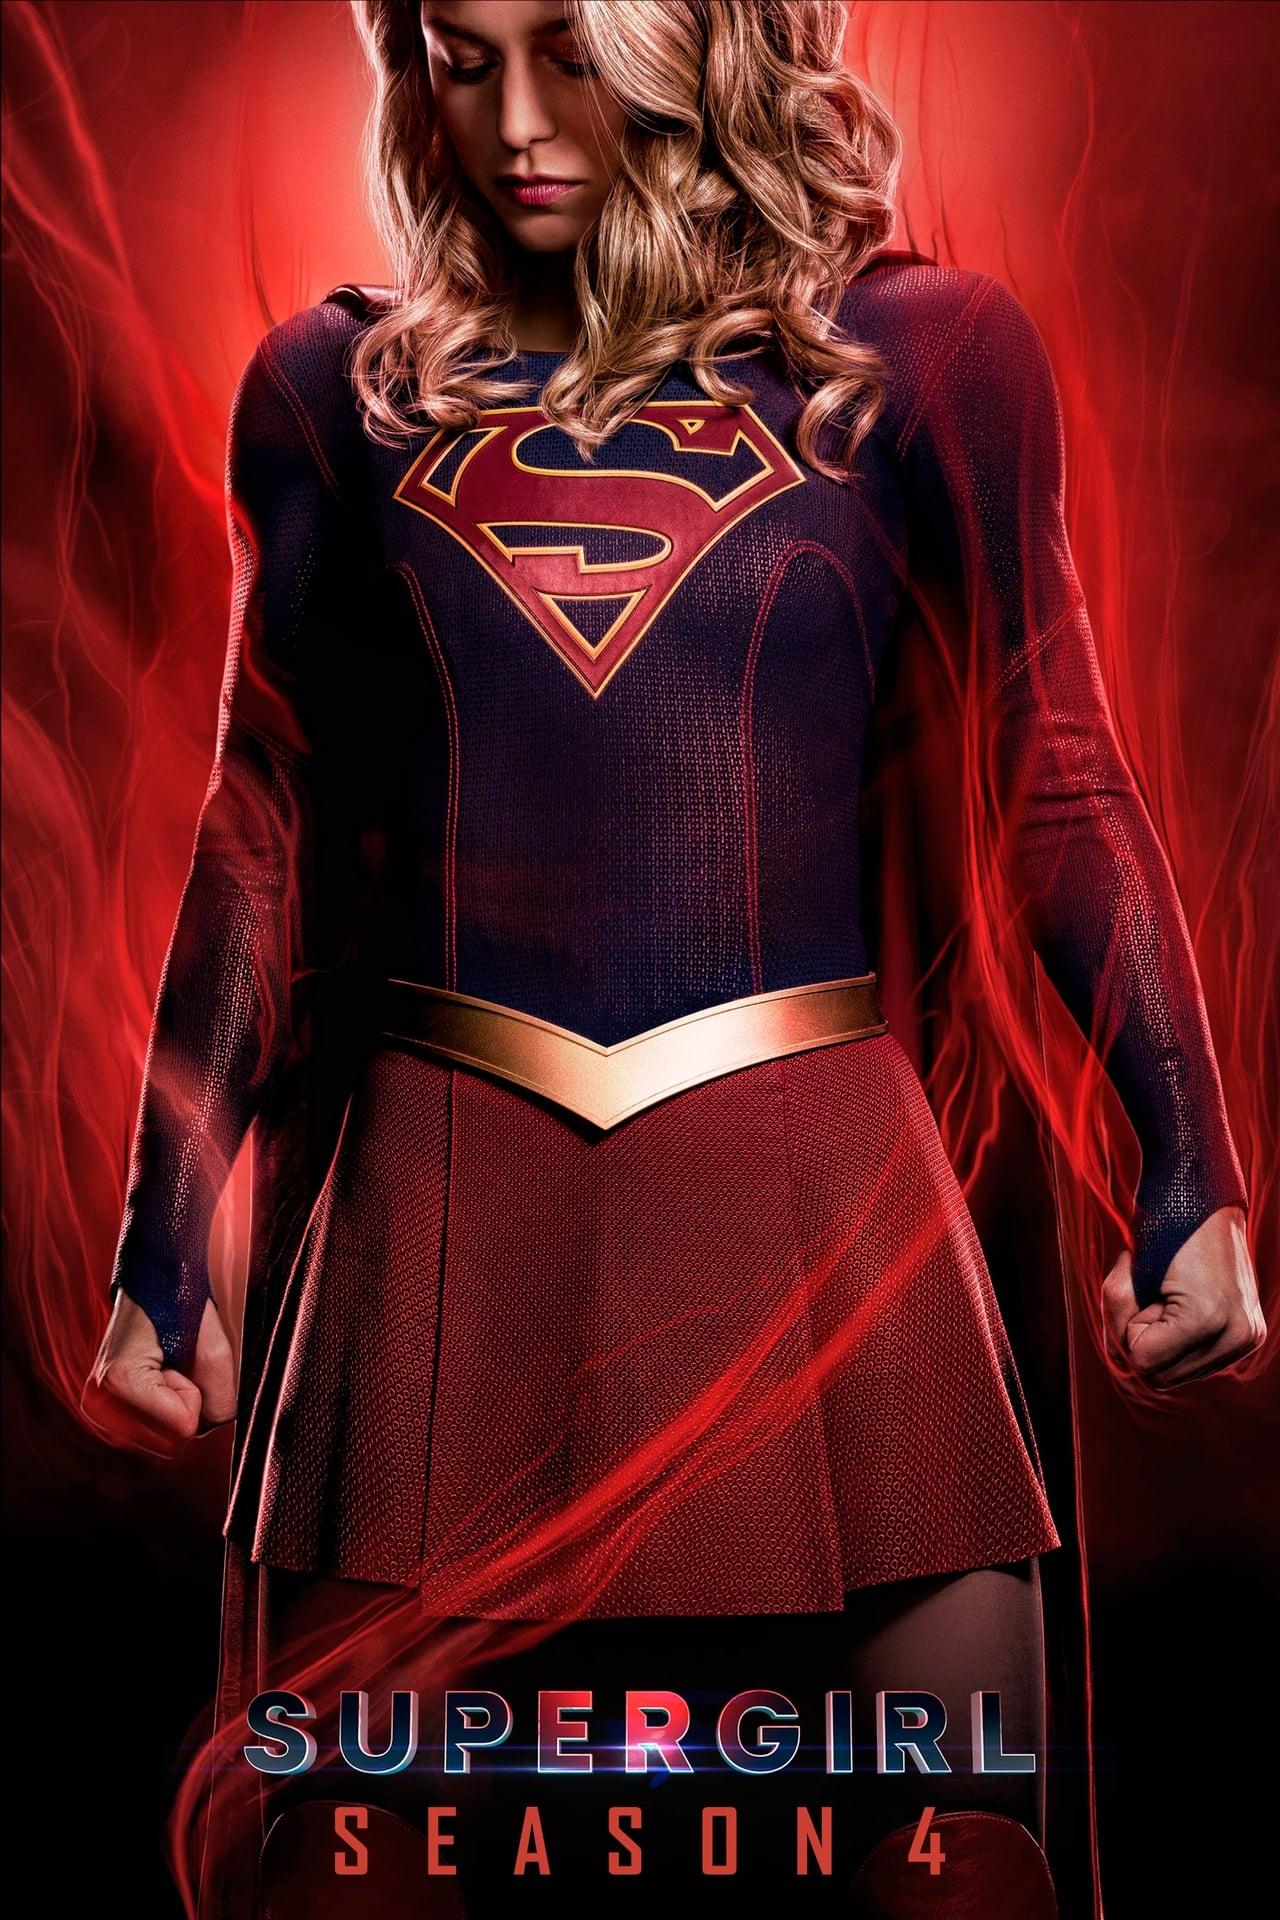 Supergirl Season 4 image